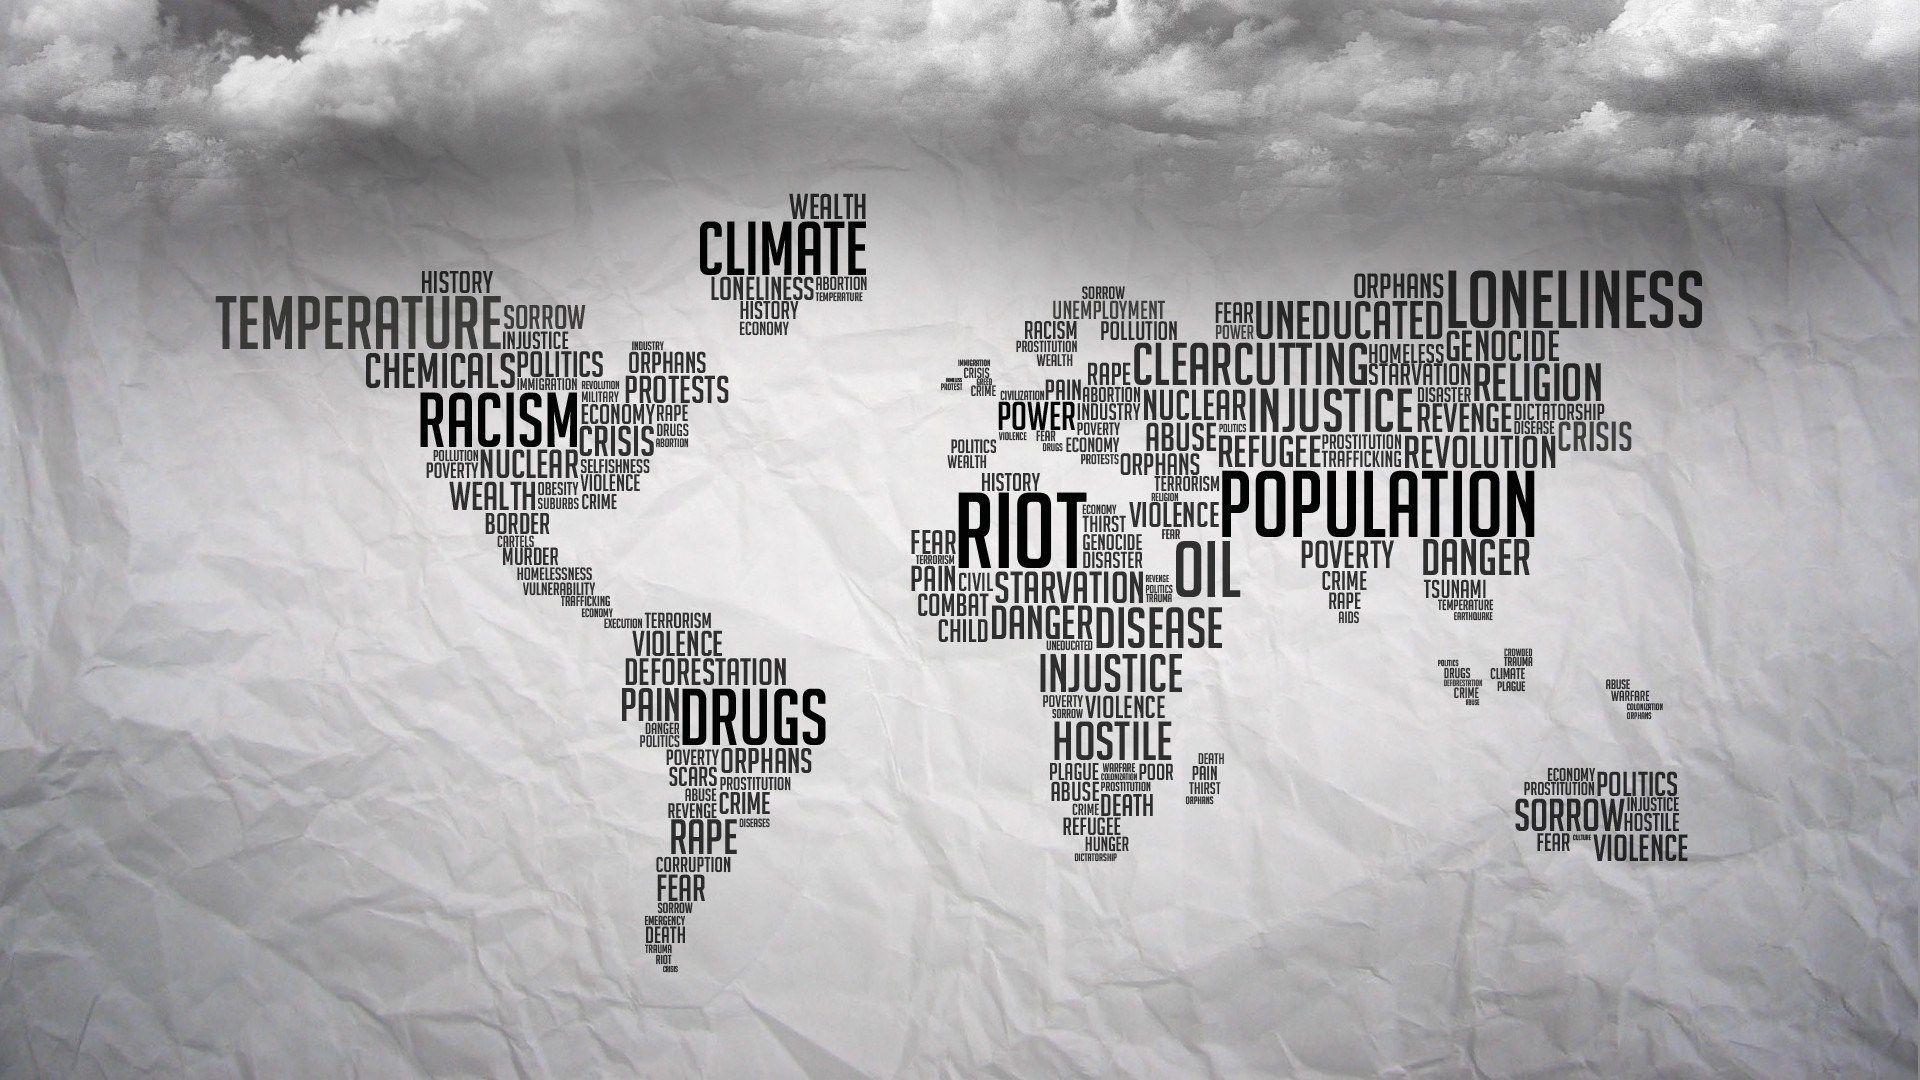 2017 03 11 world map wallpaper full hd backgrounds 1598298 2017 03 11 world map wallpaper full hd backgrounds 1598298 gumiabroncs Choice Image